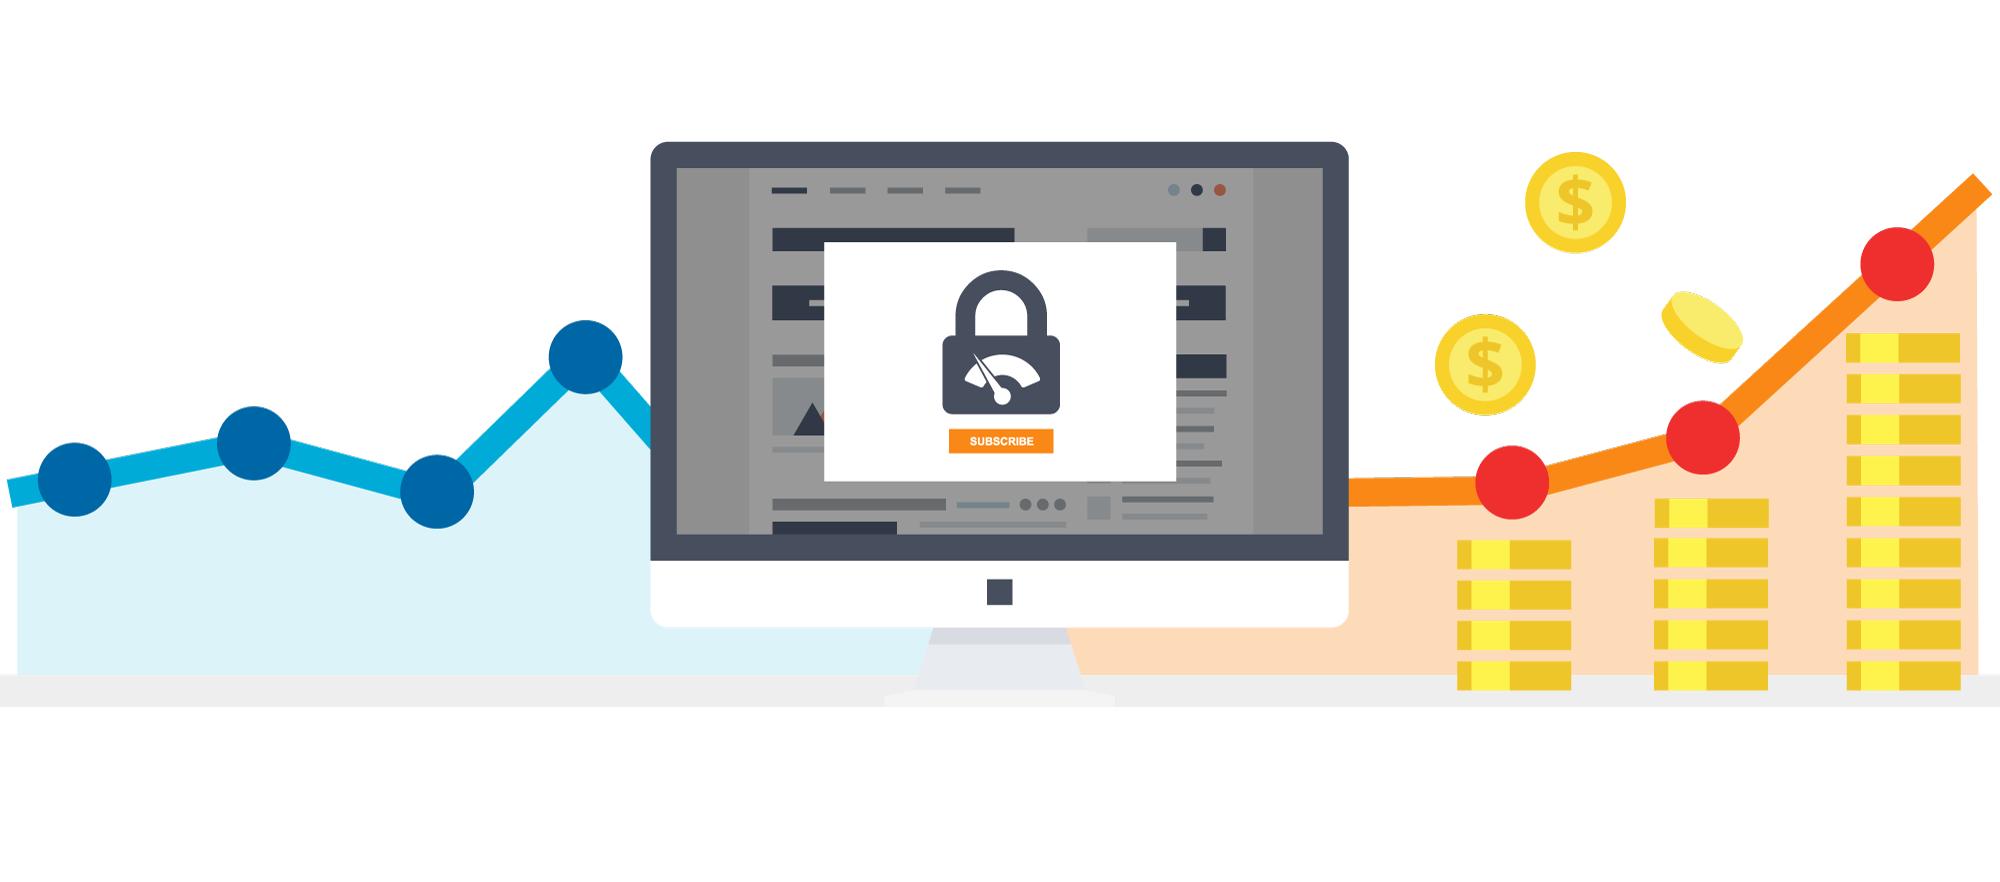 Come Creare Un Paywall In Wordpress